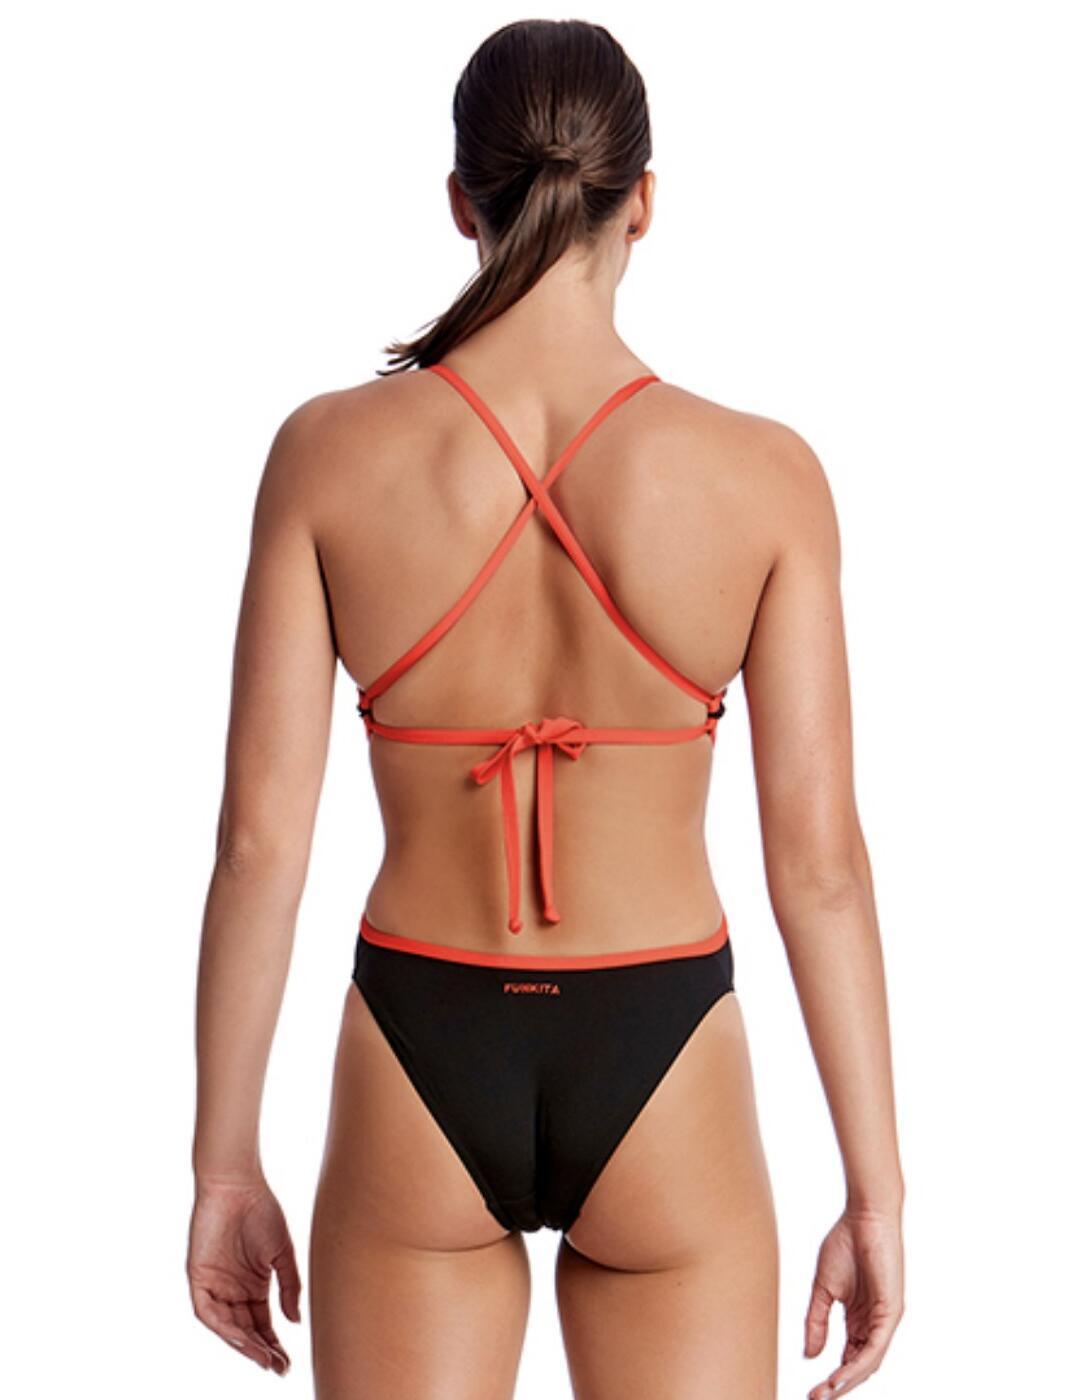 Funkita Ladies Cut Away One Piece Swimsuit FKS004L New Womens Swimwear